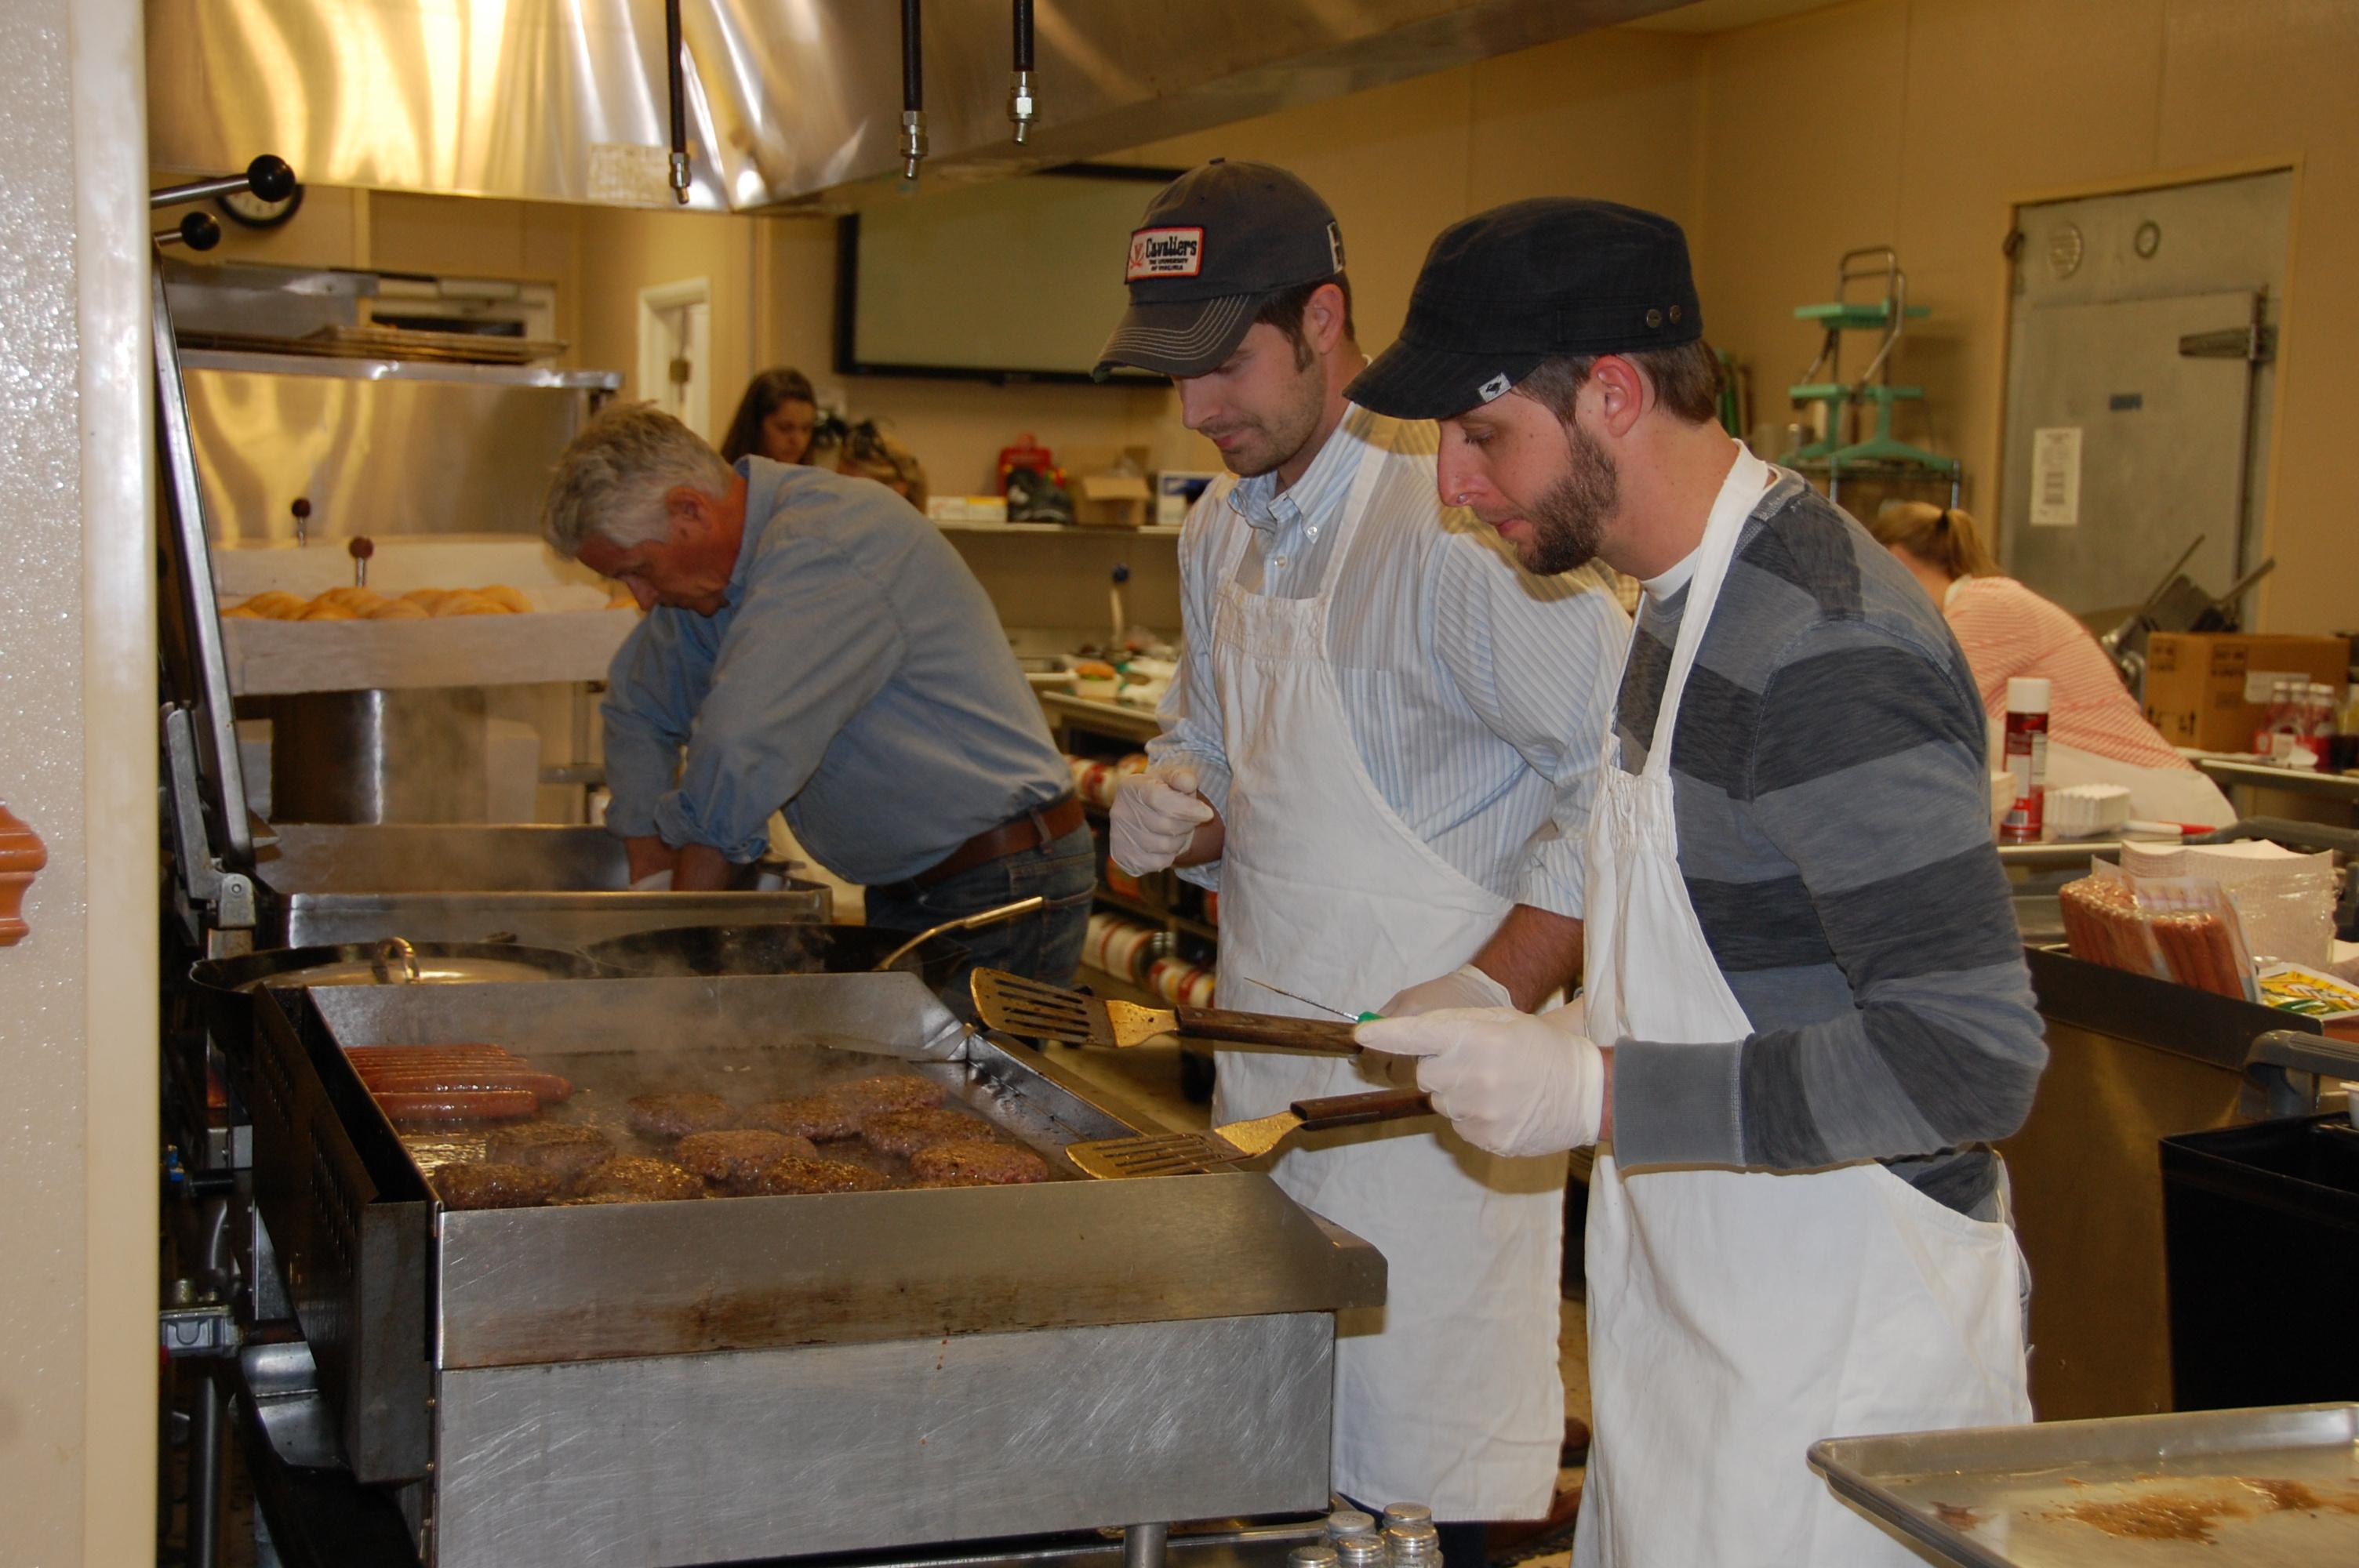 Robert (toasted all the buns), Zeke & Patrick making some Killer hamburgers